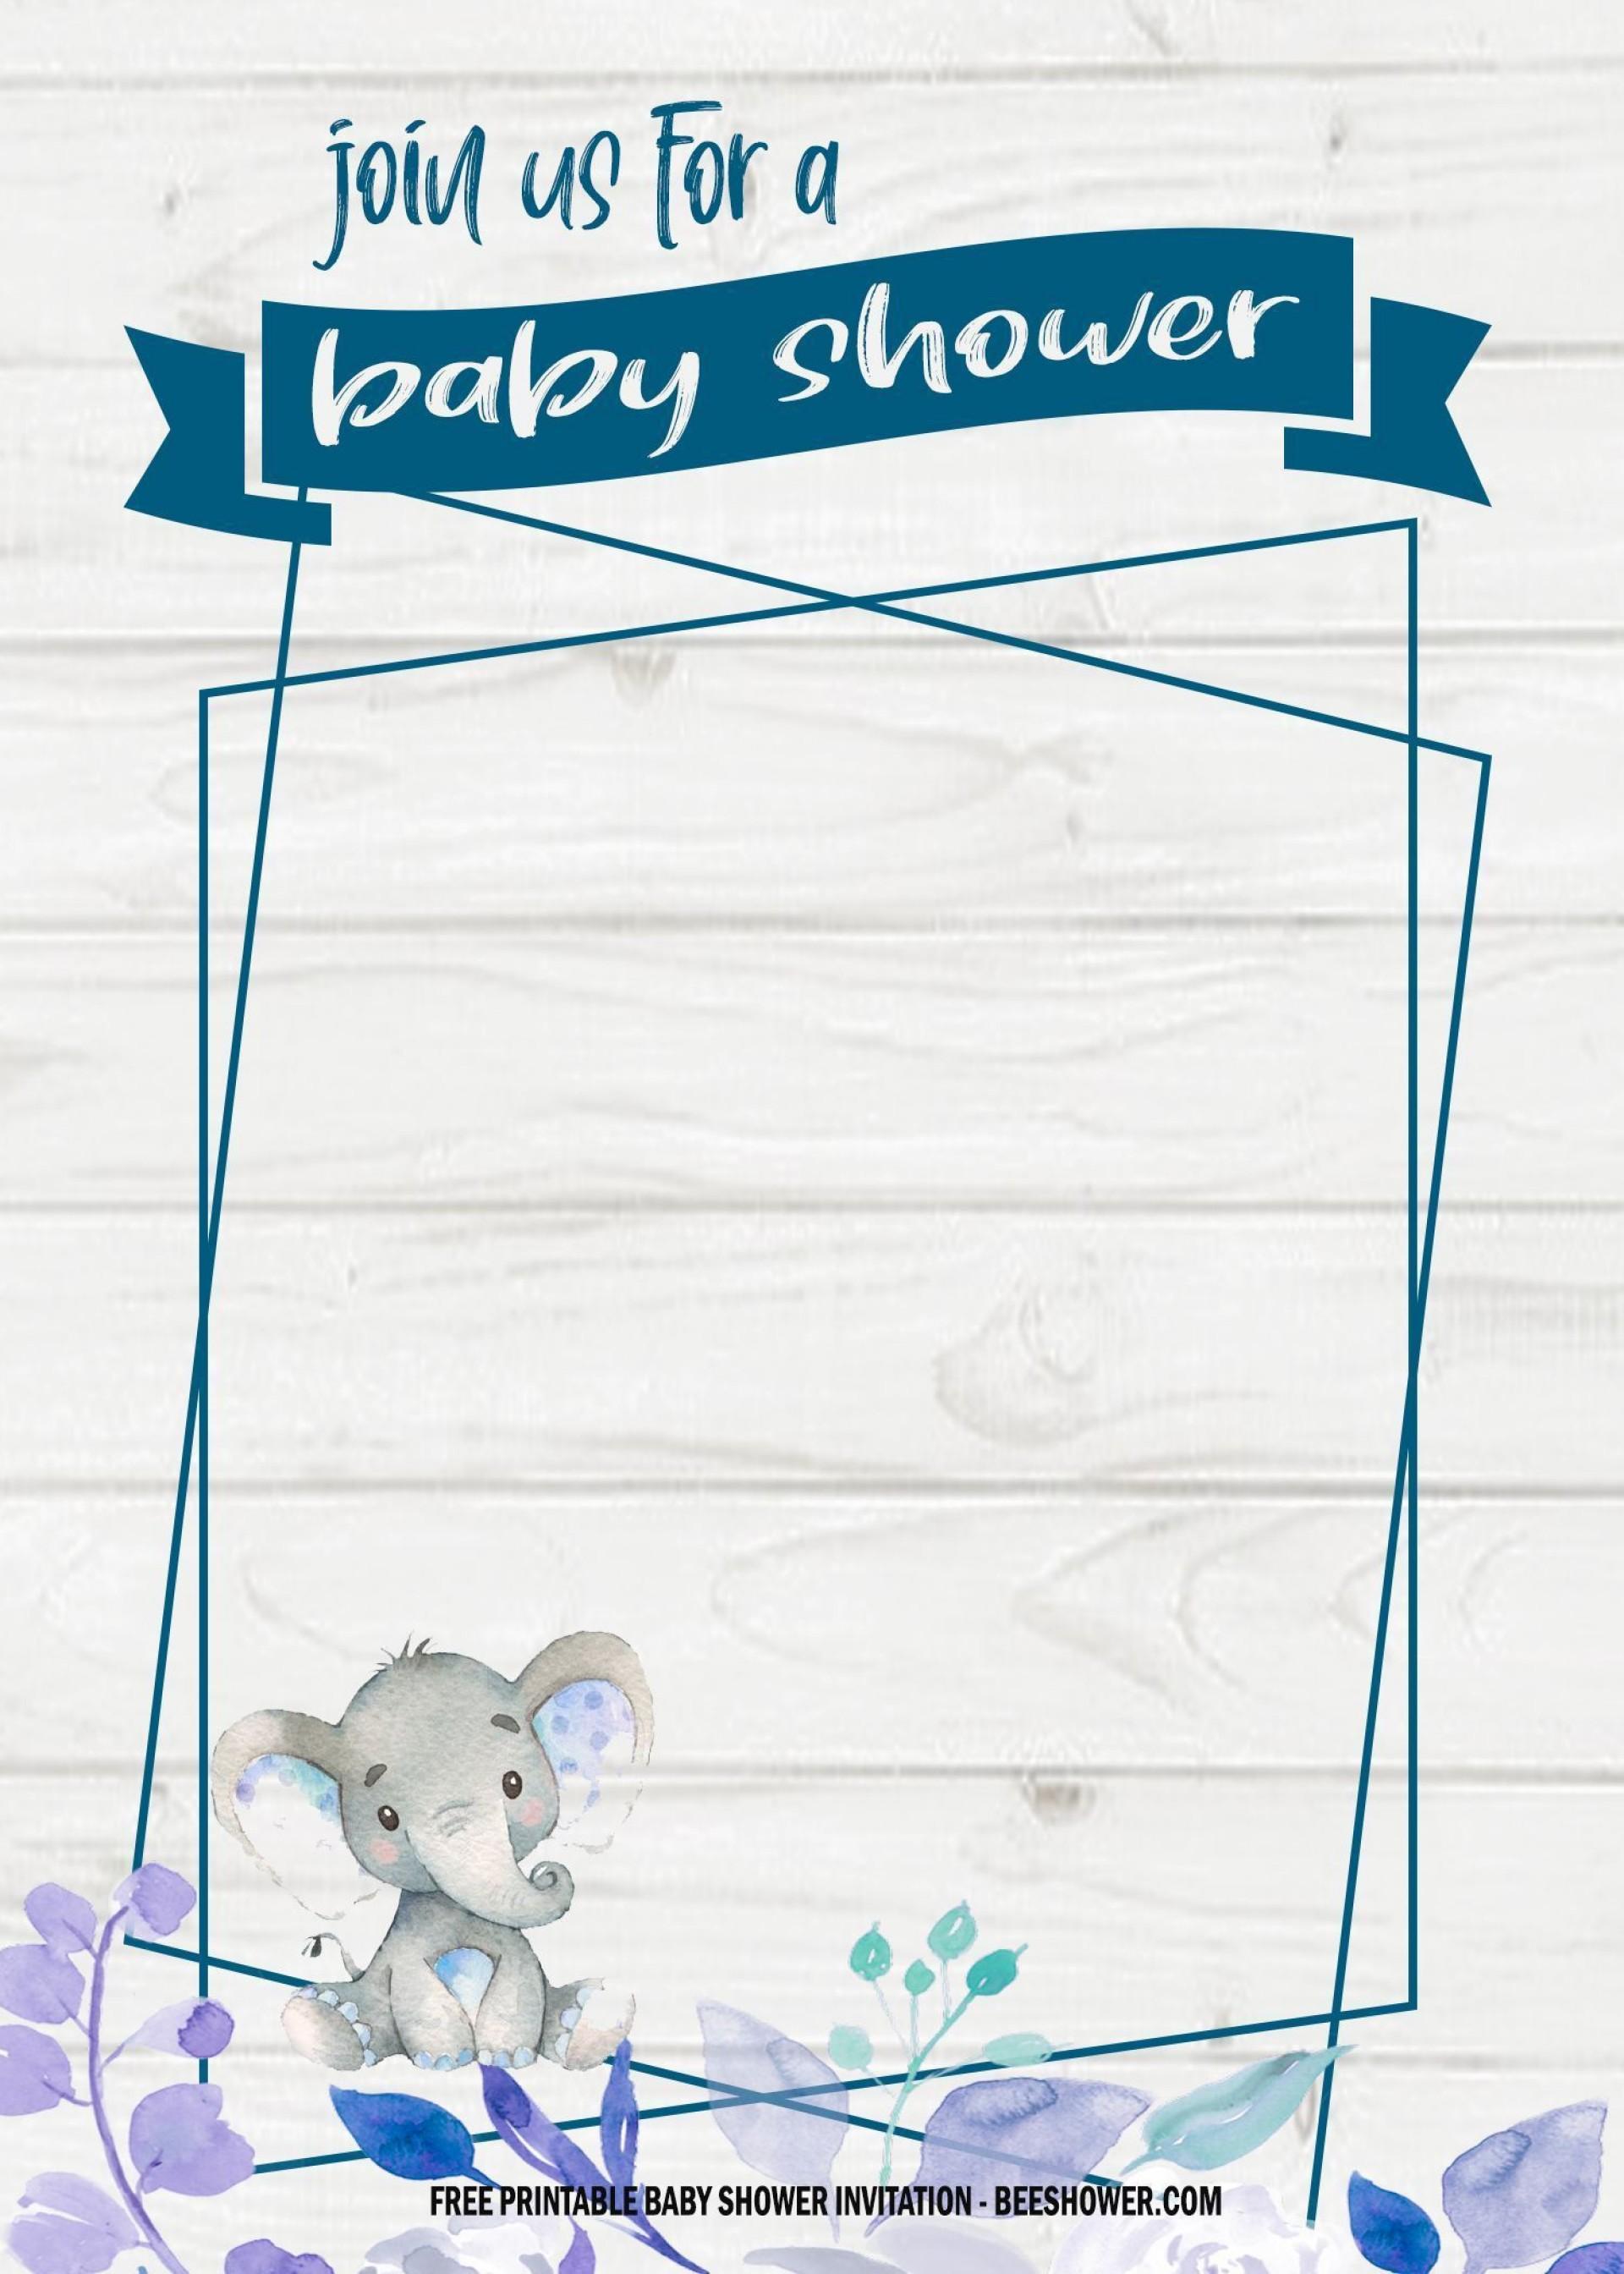 000 Incredible Free Printable Elephant Baby Shower Invitation Template Inspiration  Templates Editable1920